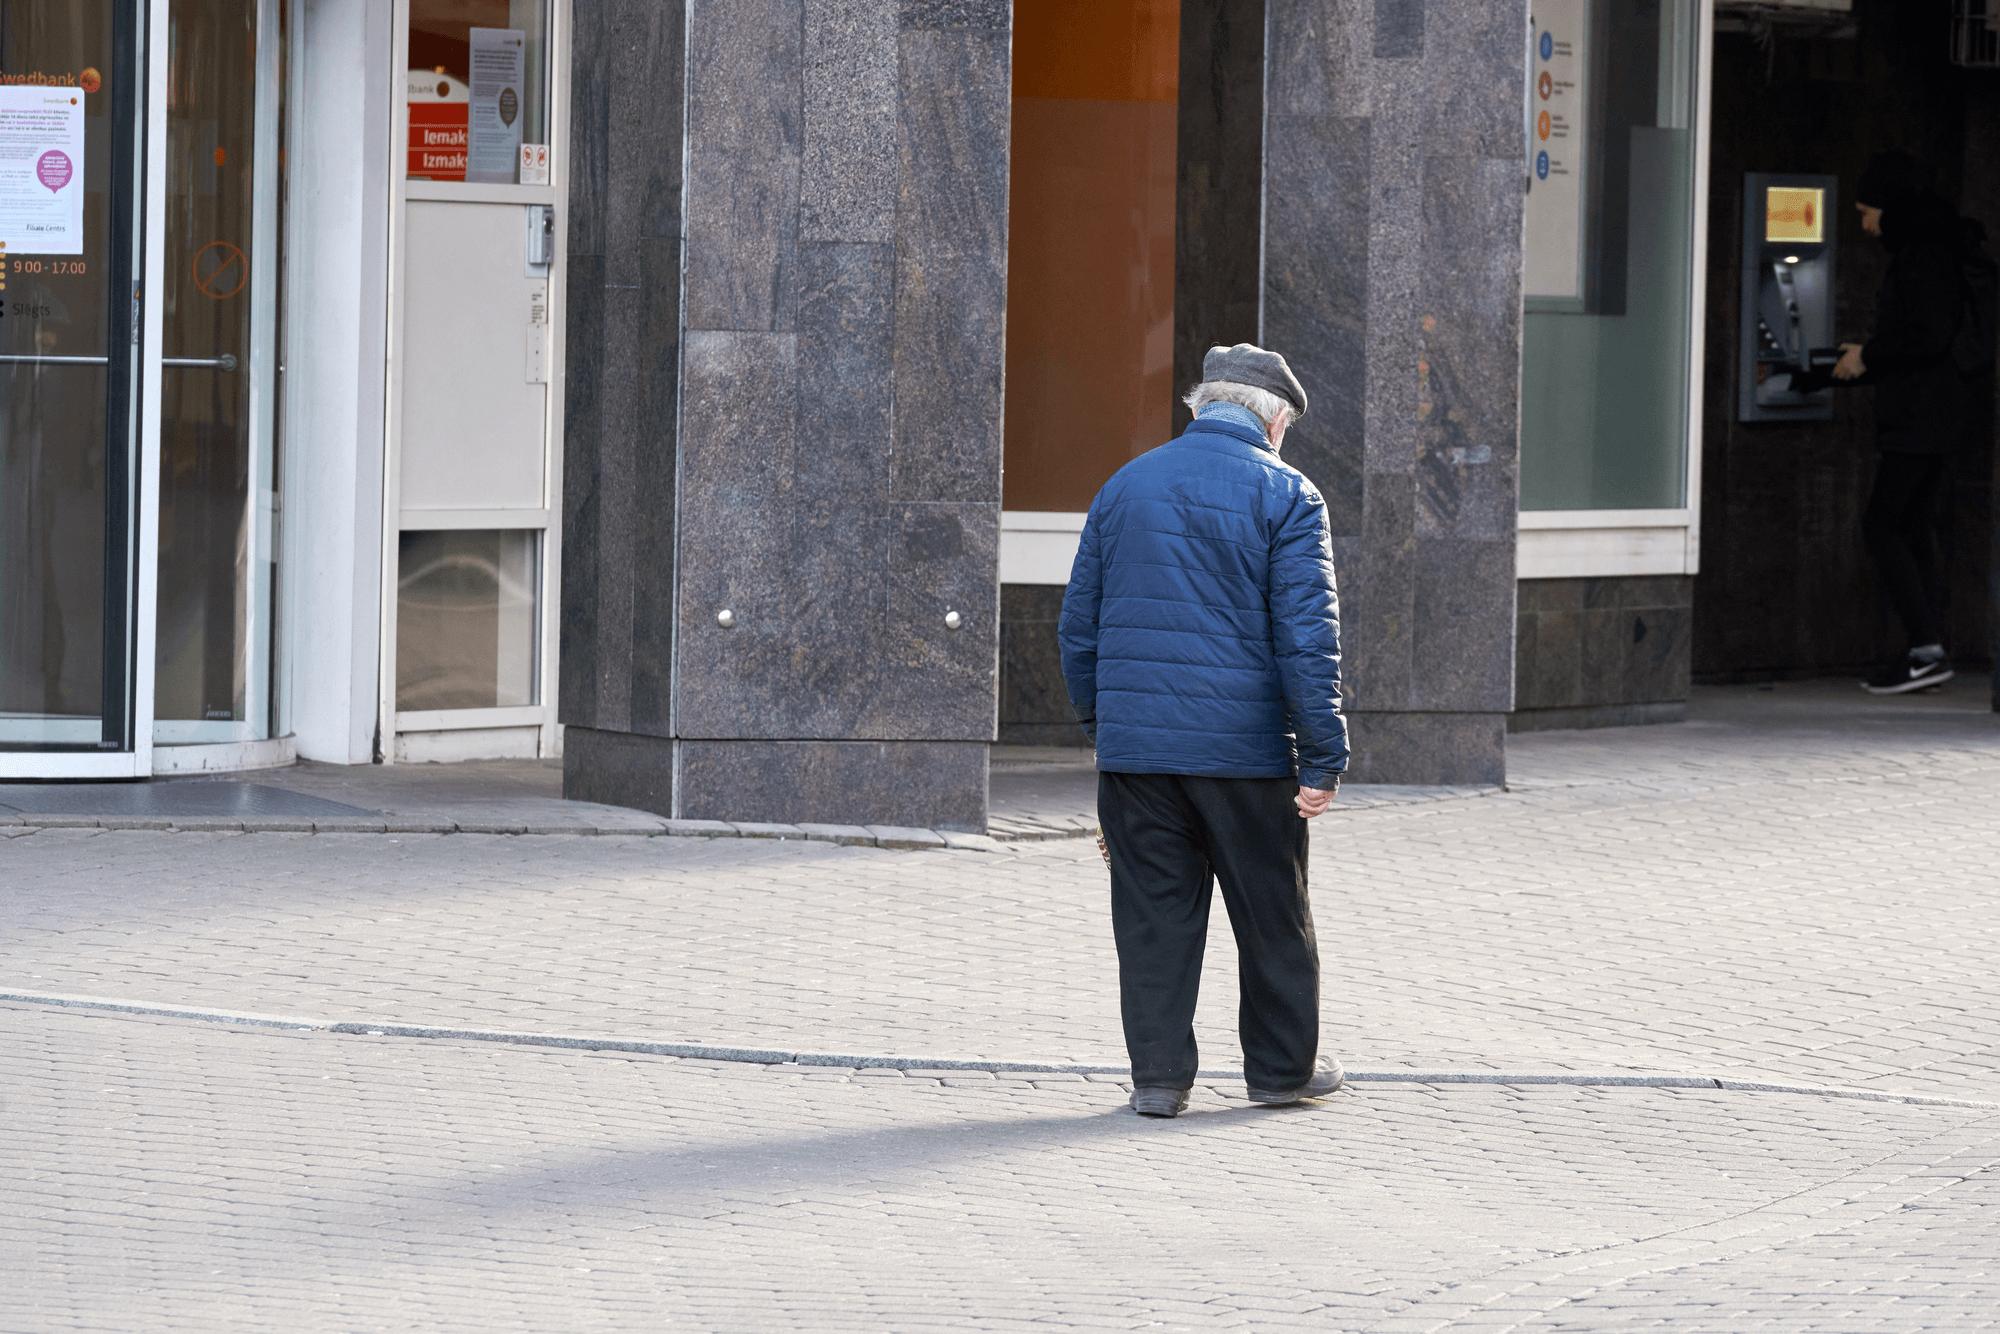 Shutterstock / OlegRi